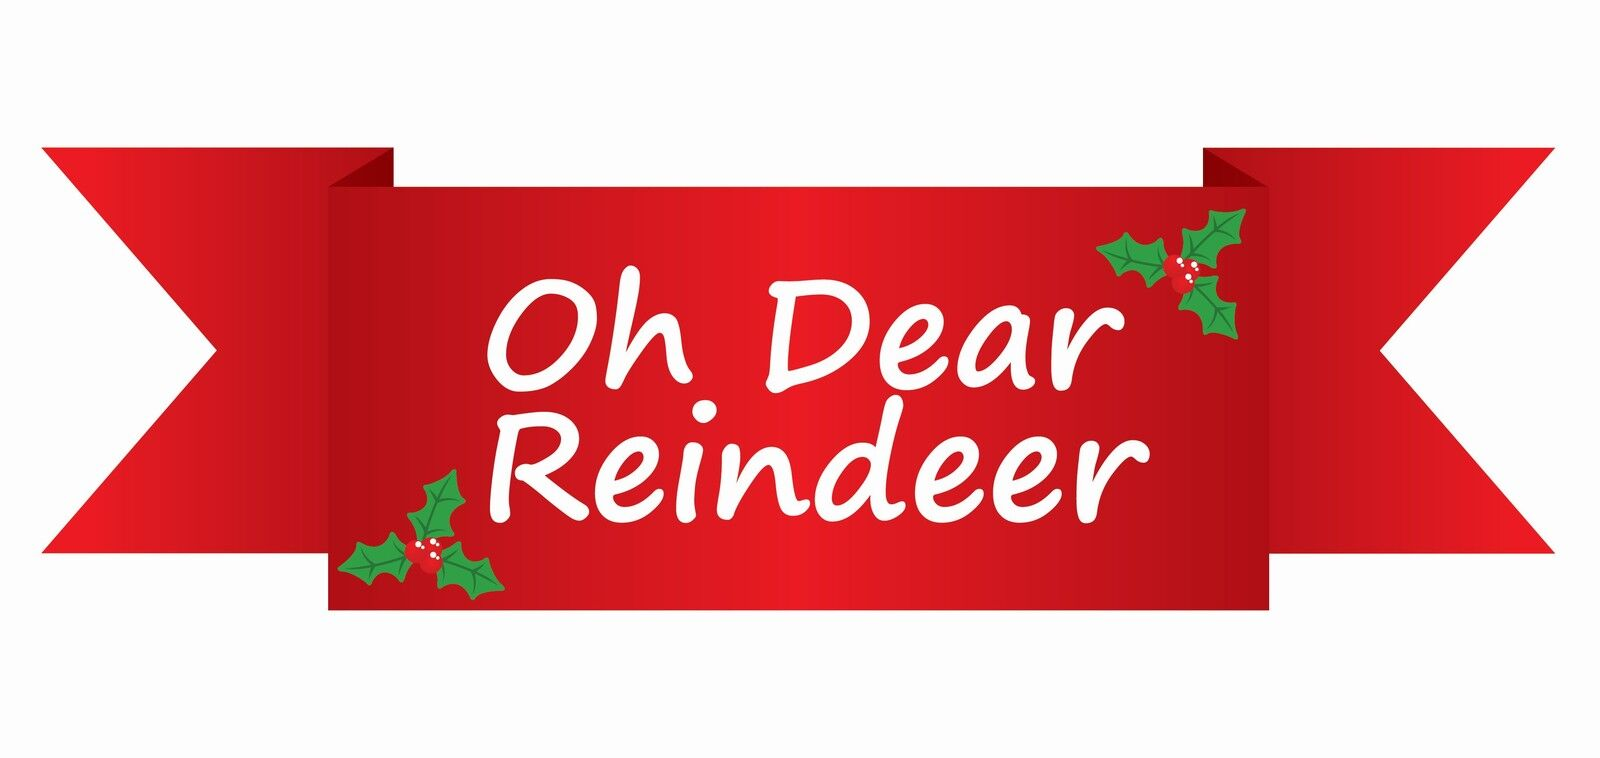 Oh Dear Reindeer